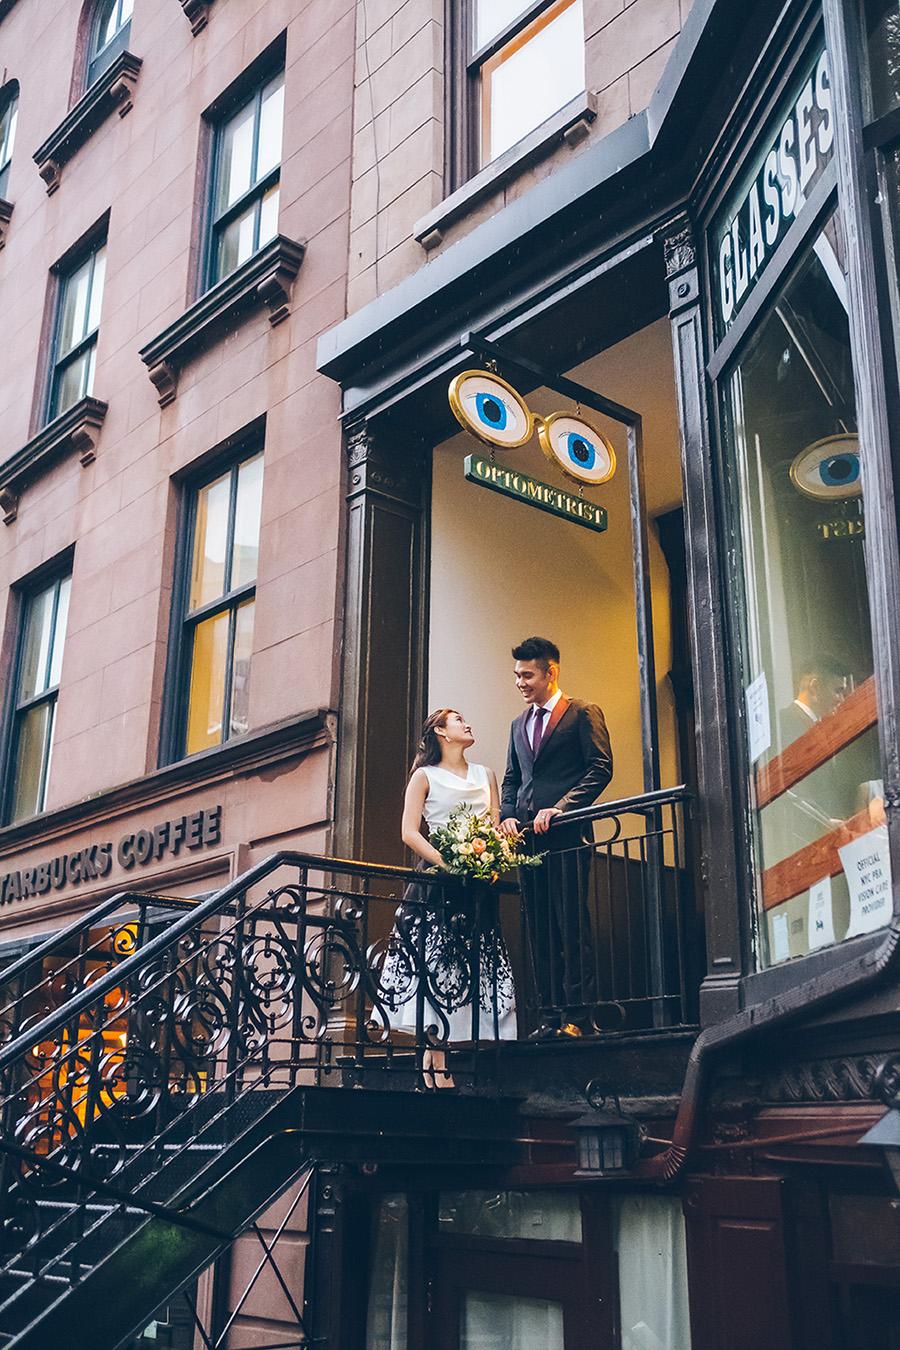 NEW-YORK-CITY-WEDDING-PHOTOGRAPHER-INTIMATE-WEDDING-ELOPEMENT-BROOKLYN-PROMENADE-CITYHALL-MANHATTAN-BROOKLYN-WEDDING-PHOTOGRAPHY-JackieAaron-0054.jpg